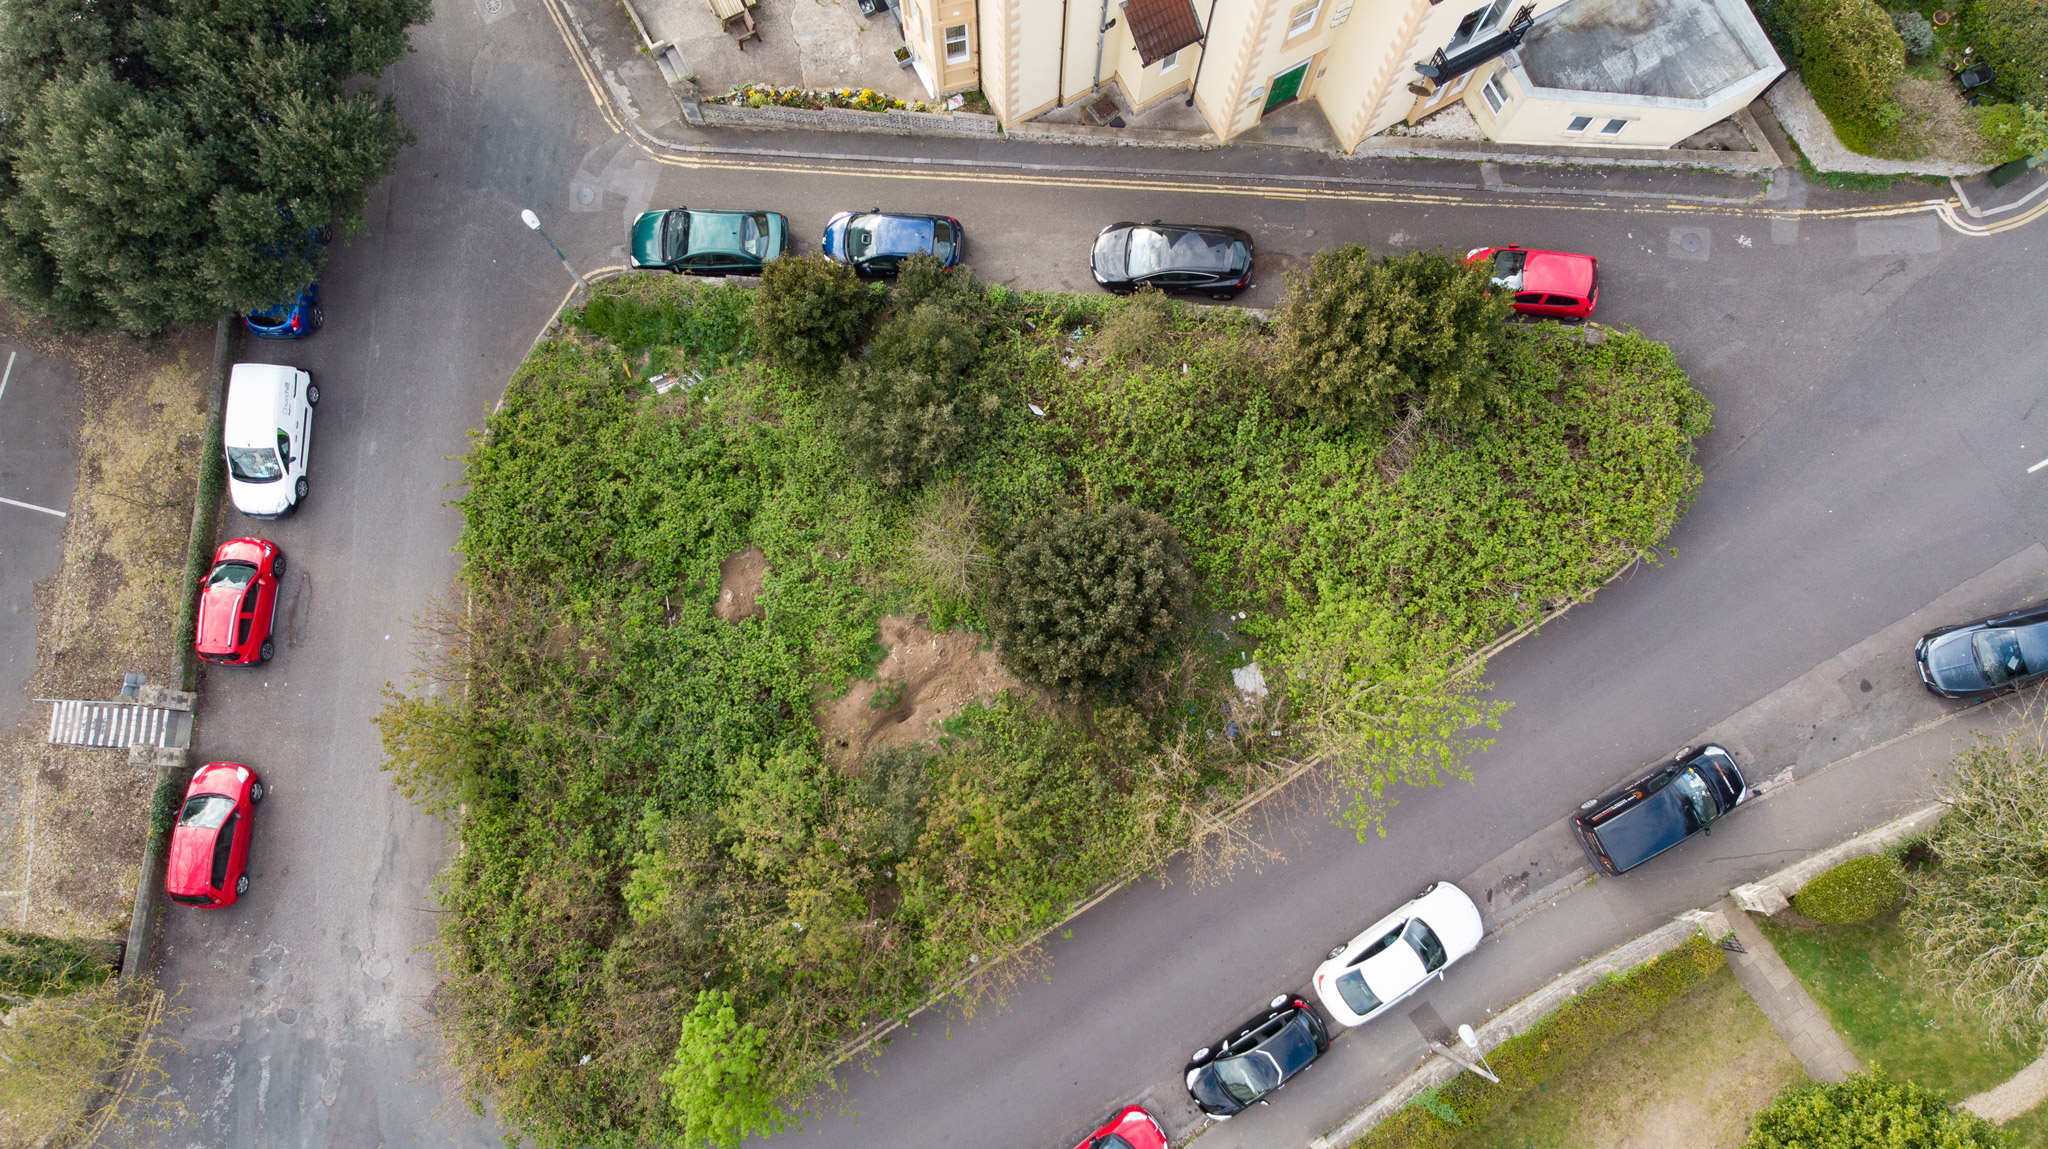 Drone photo of land in Weston super Mare